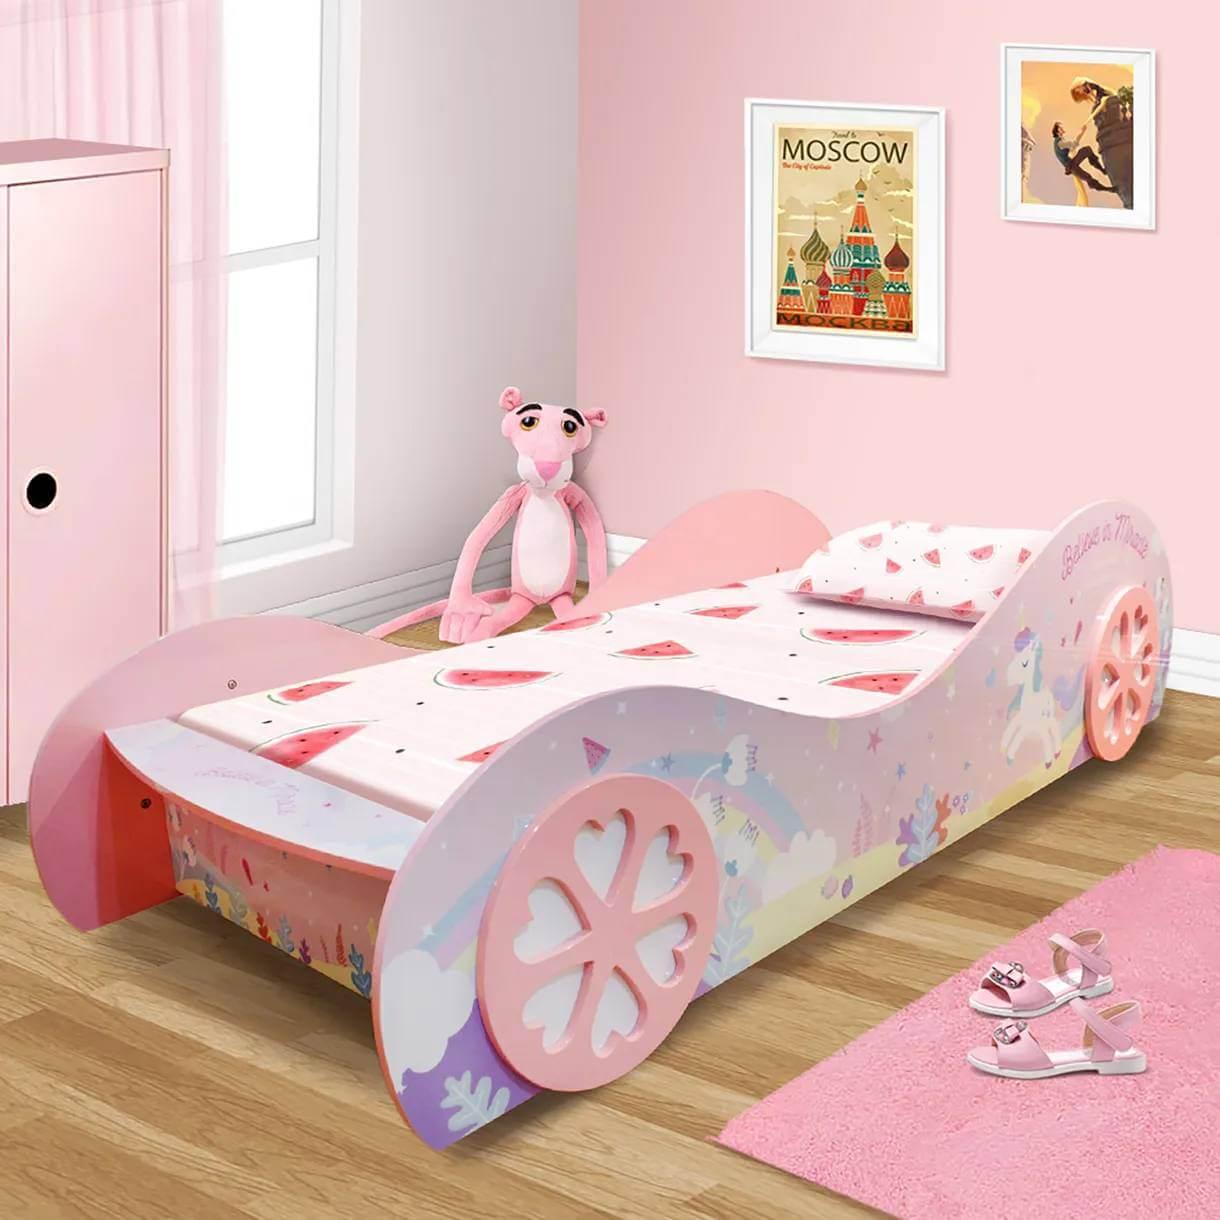 Unicorn Kids Beds for Boys